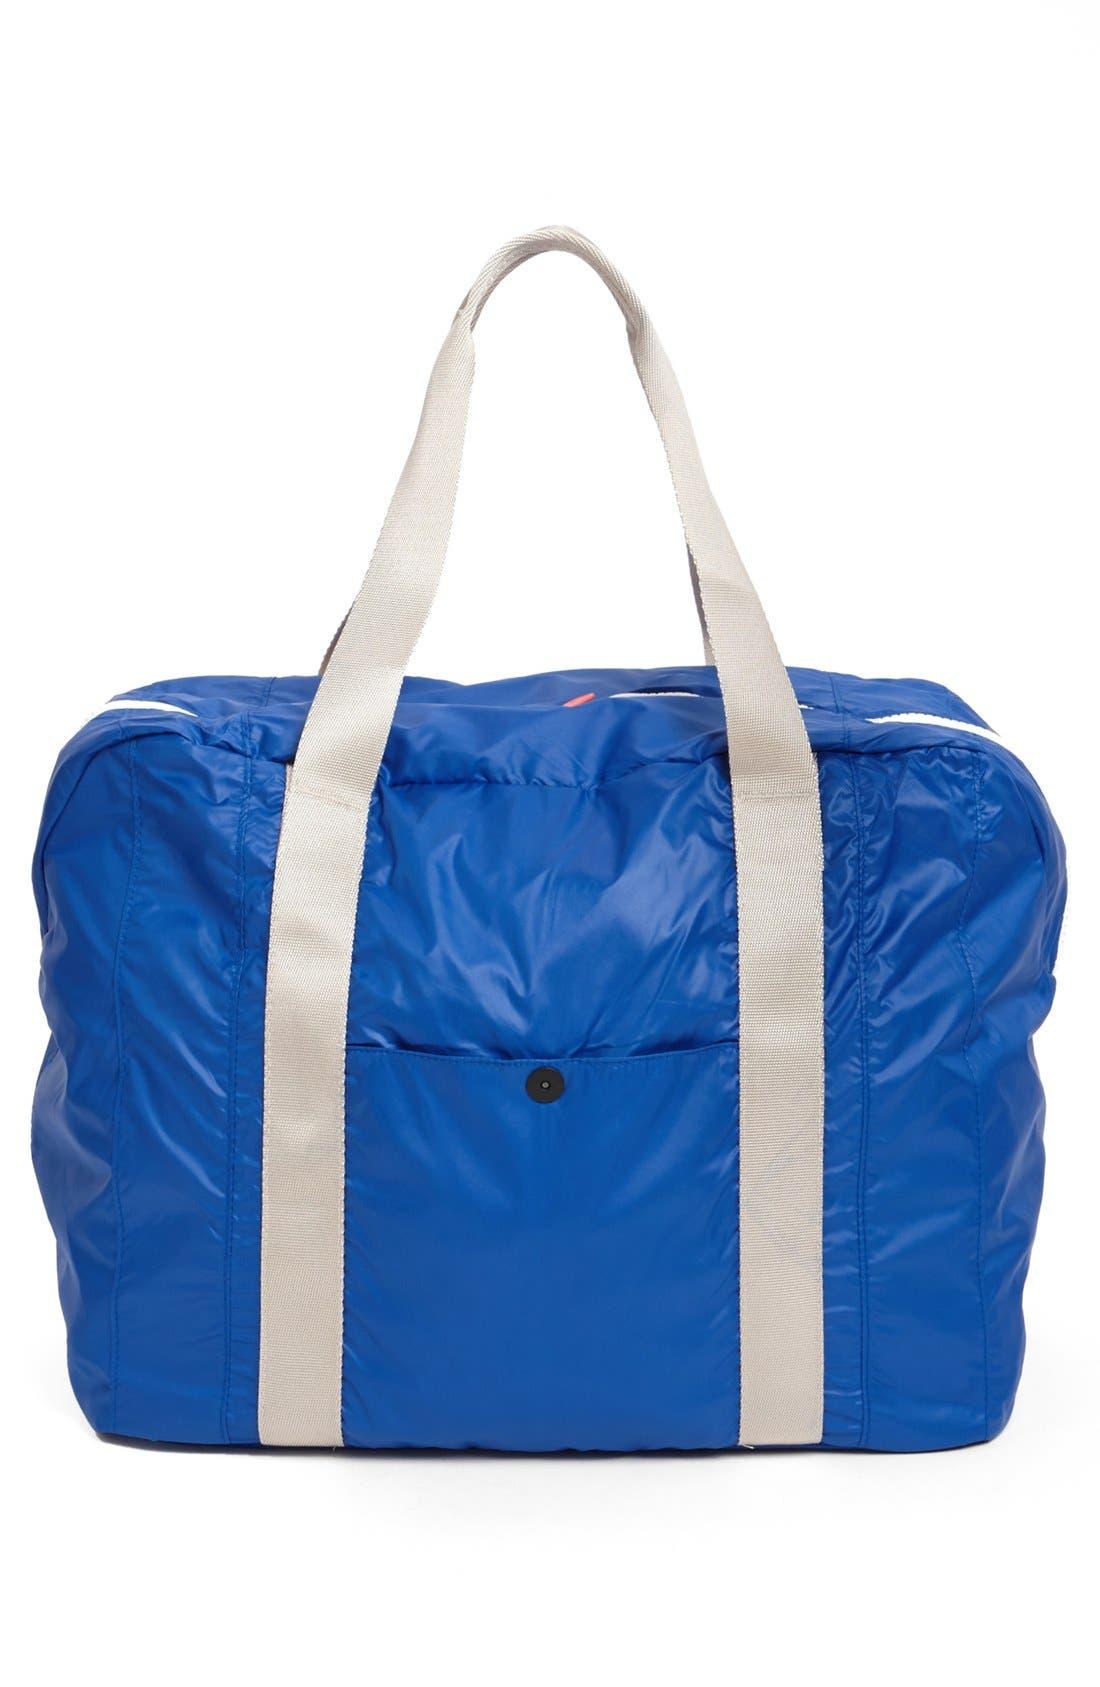 Alternate Image 2  - adidas by Stella McCartney 'Big Carry On' Bag